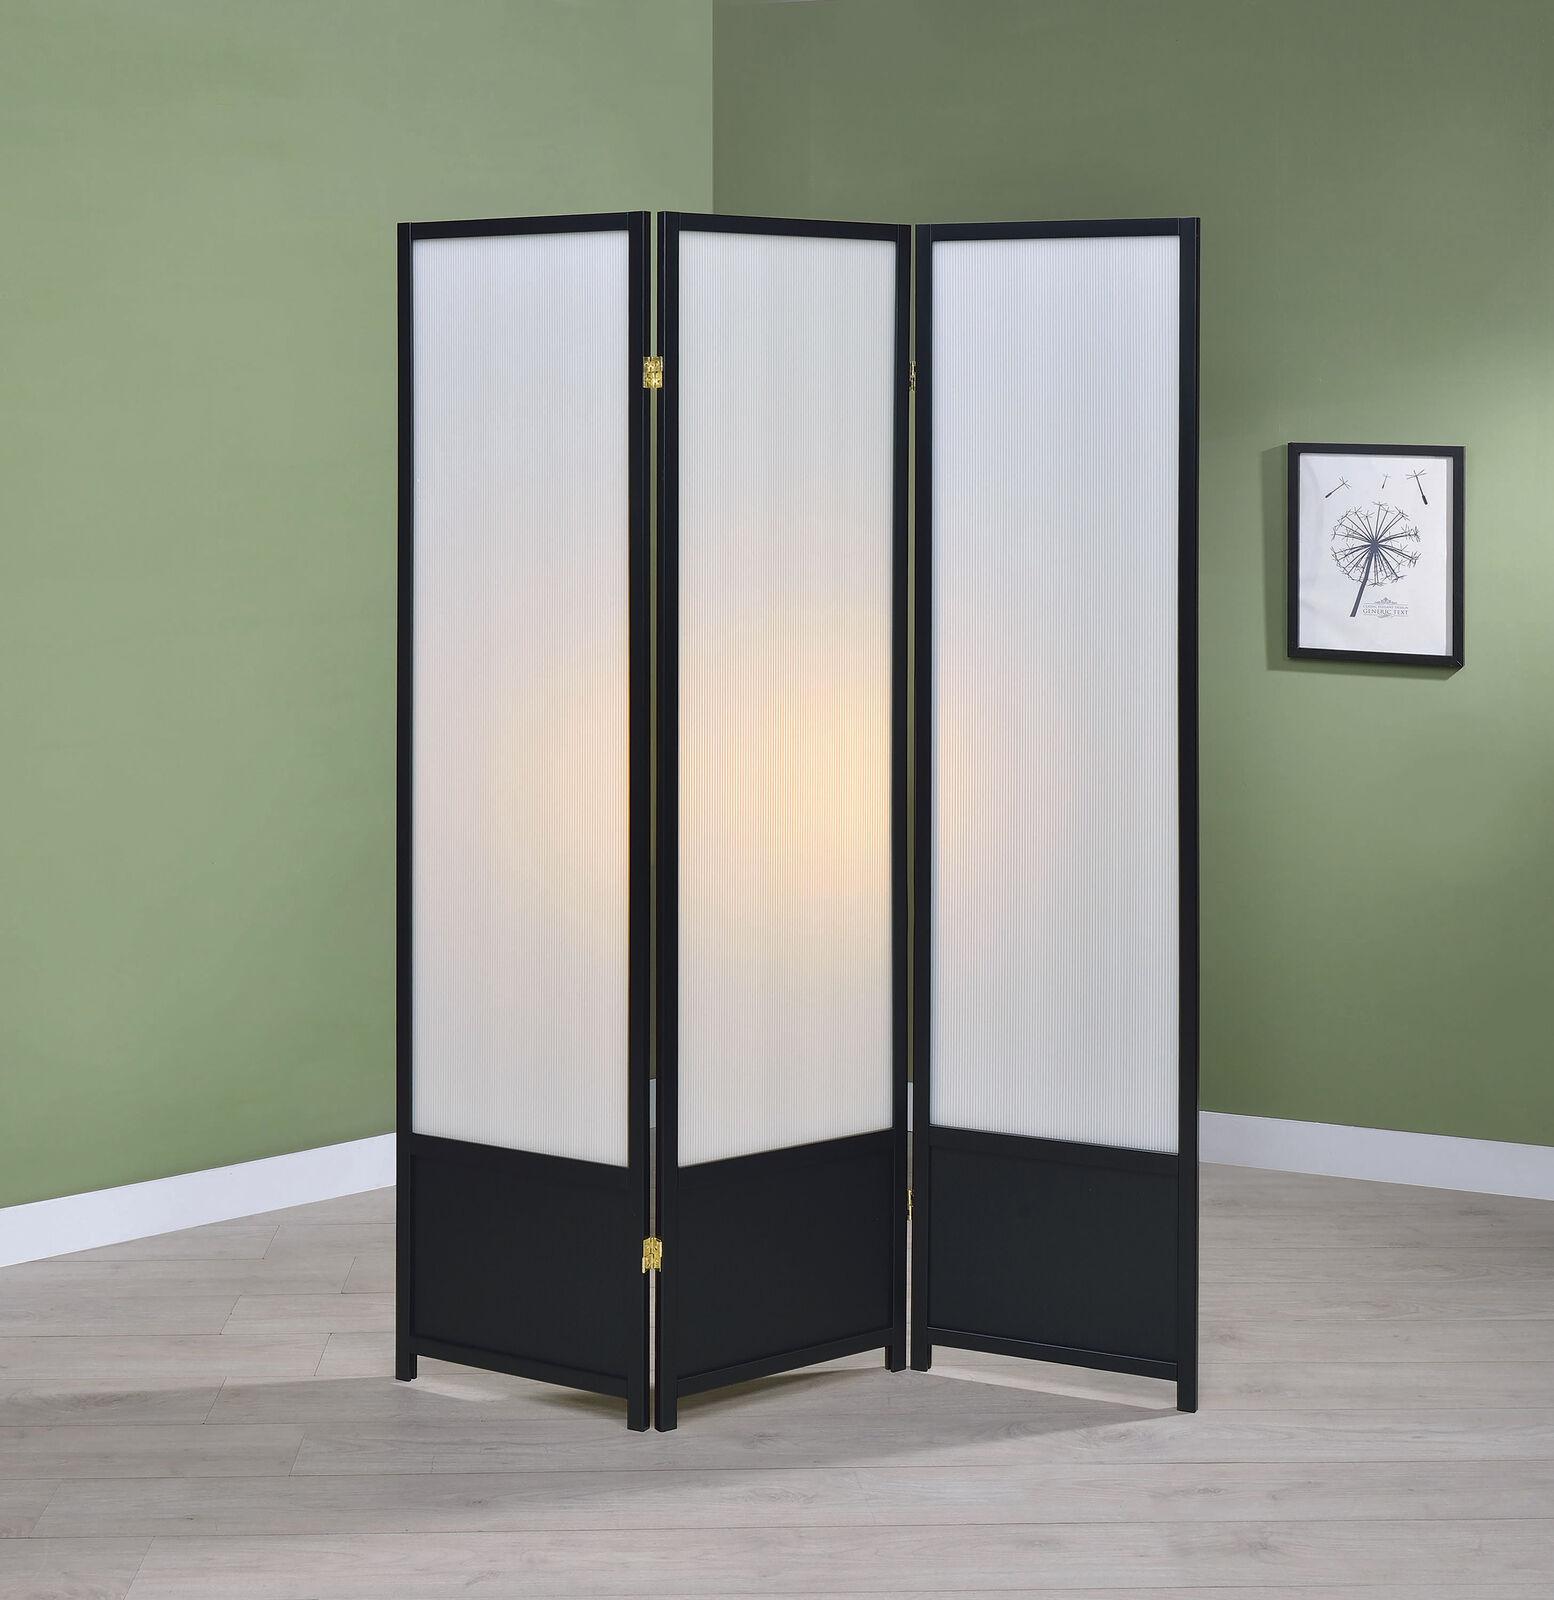 3 Panel Folding Screen Room Divider Solid Wood Black Walnut White 2 Way Hinges For Sale Online Ebay